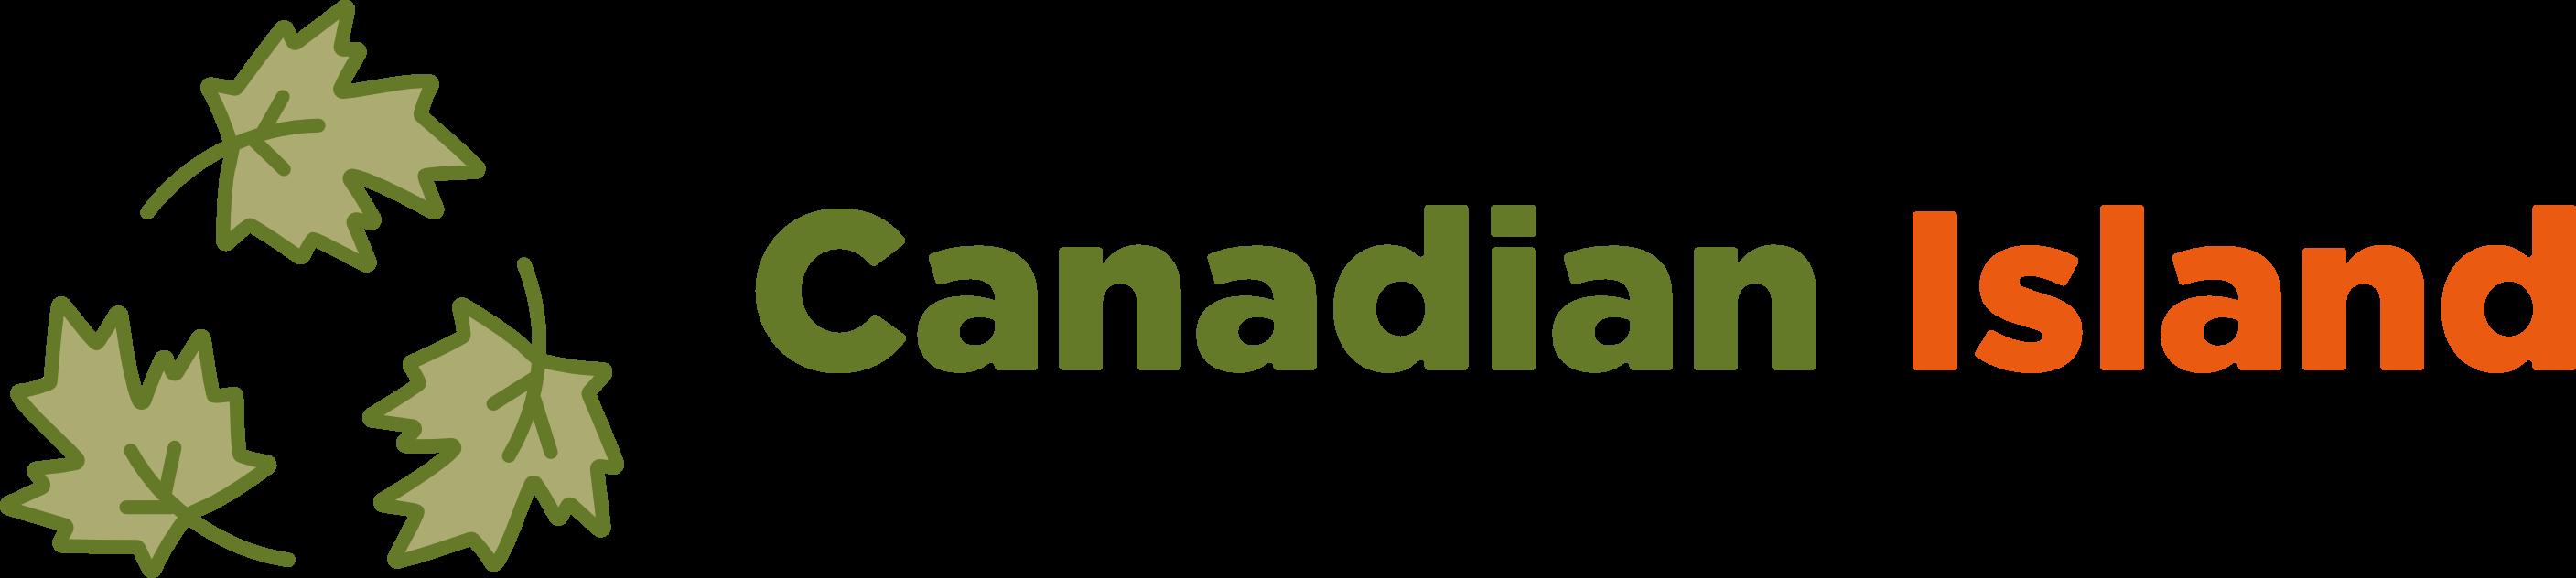 logo-canadian-island